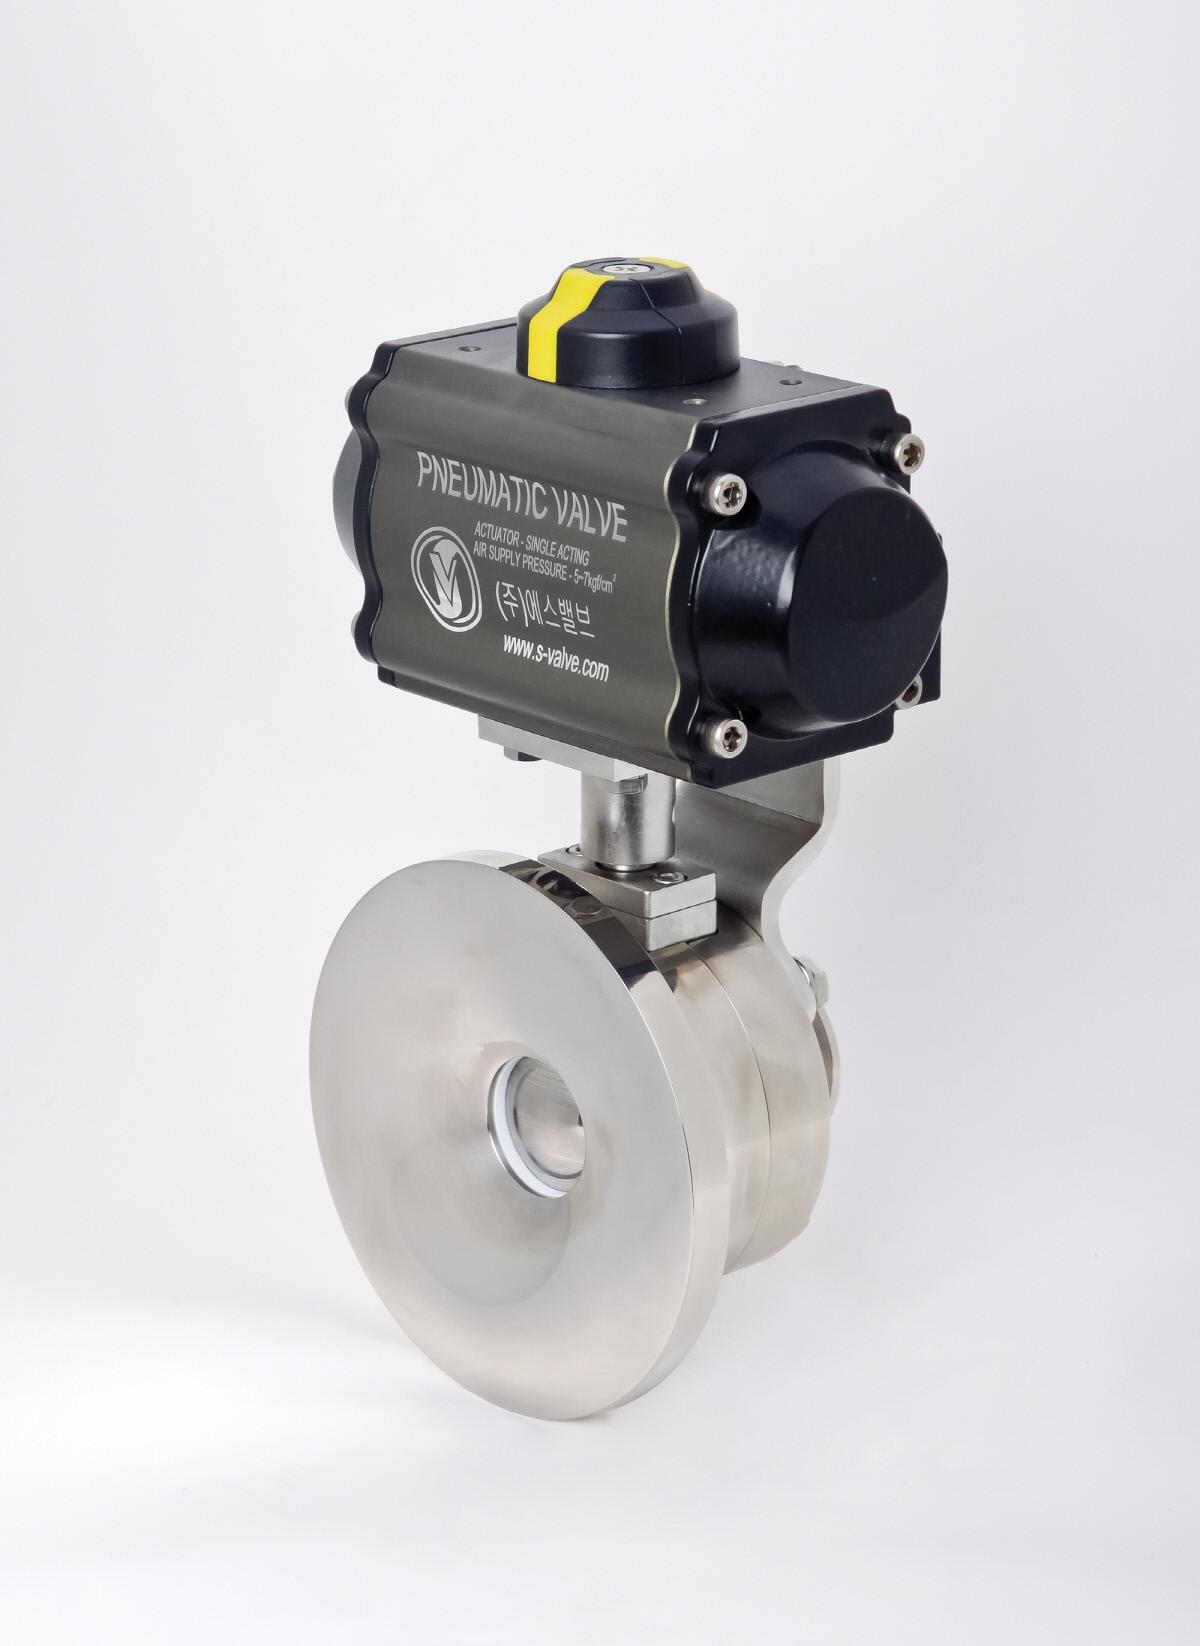 S-valve_0093.jpg